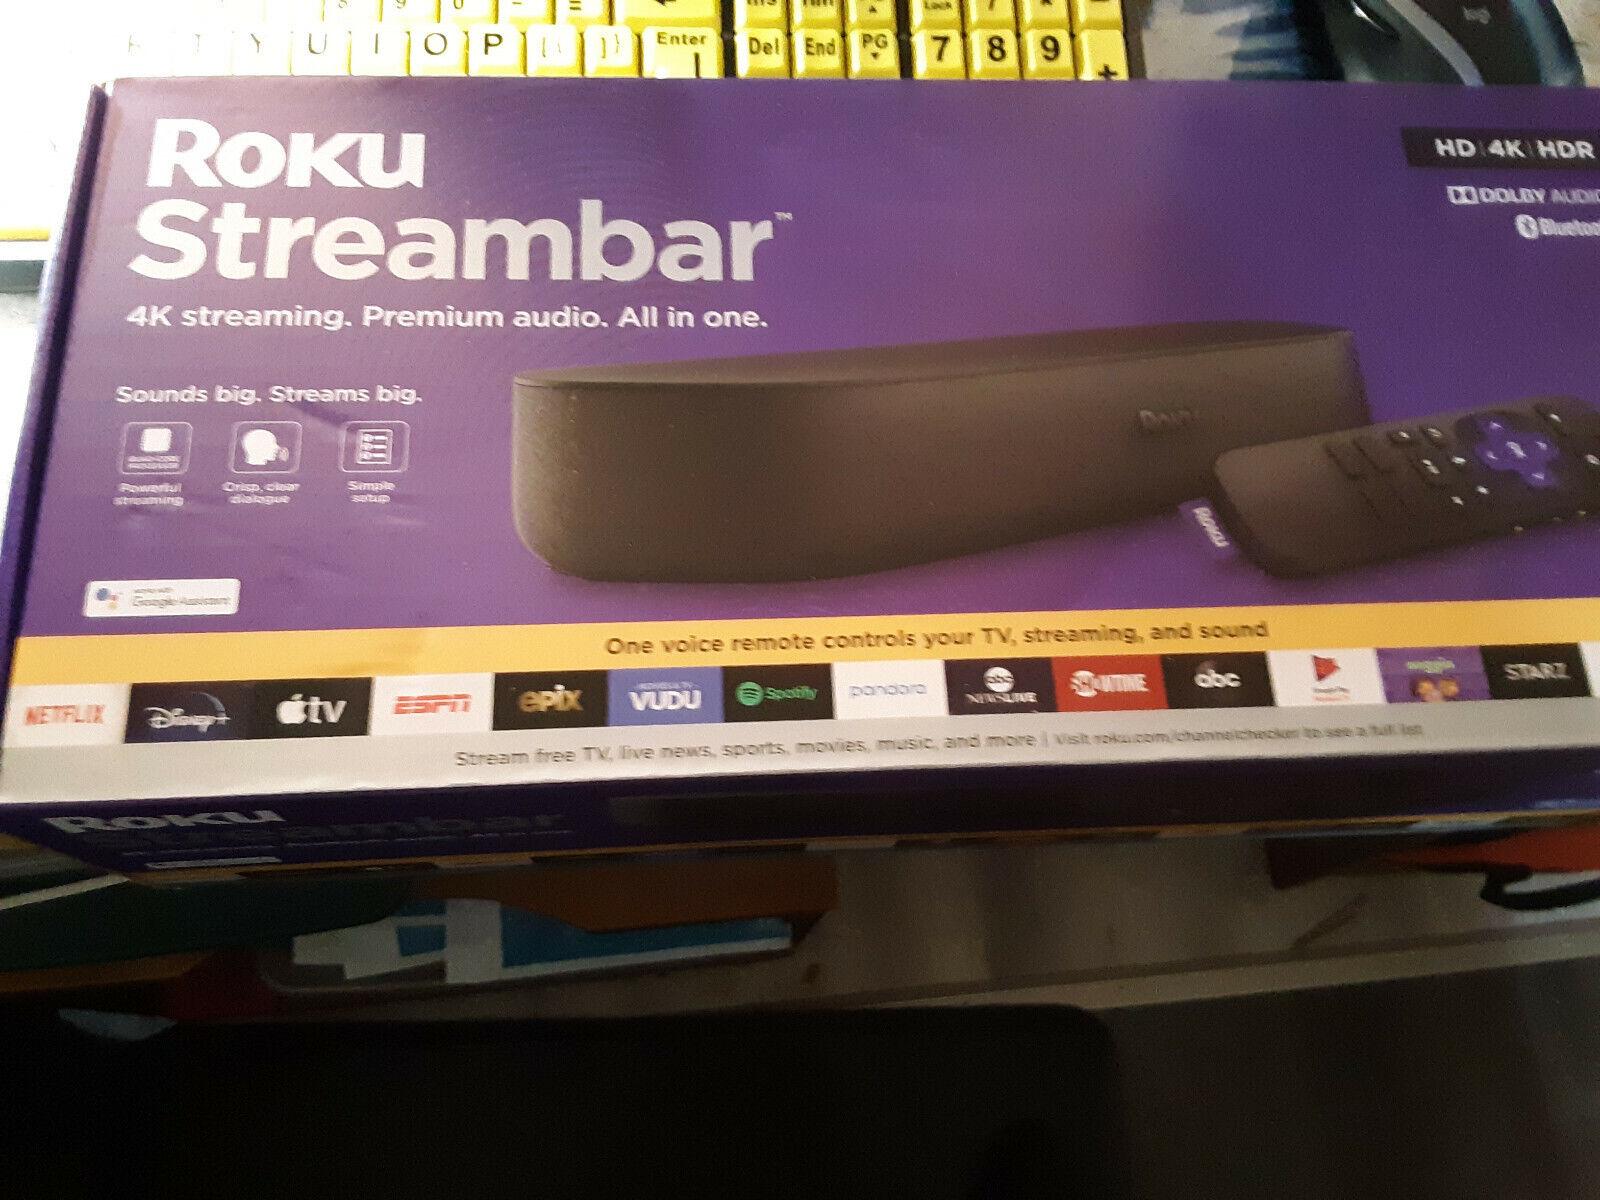 2020! Roku Streambar (9102RW) Powerful 4K Streaming Media Player NEW! FreeShip freeship media player powerful roku streambar streaming